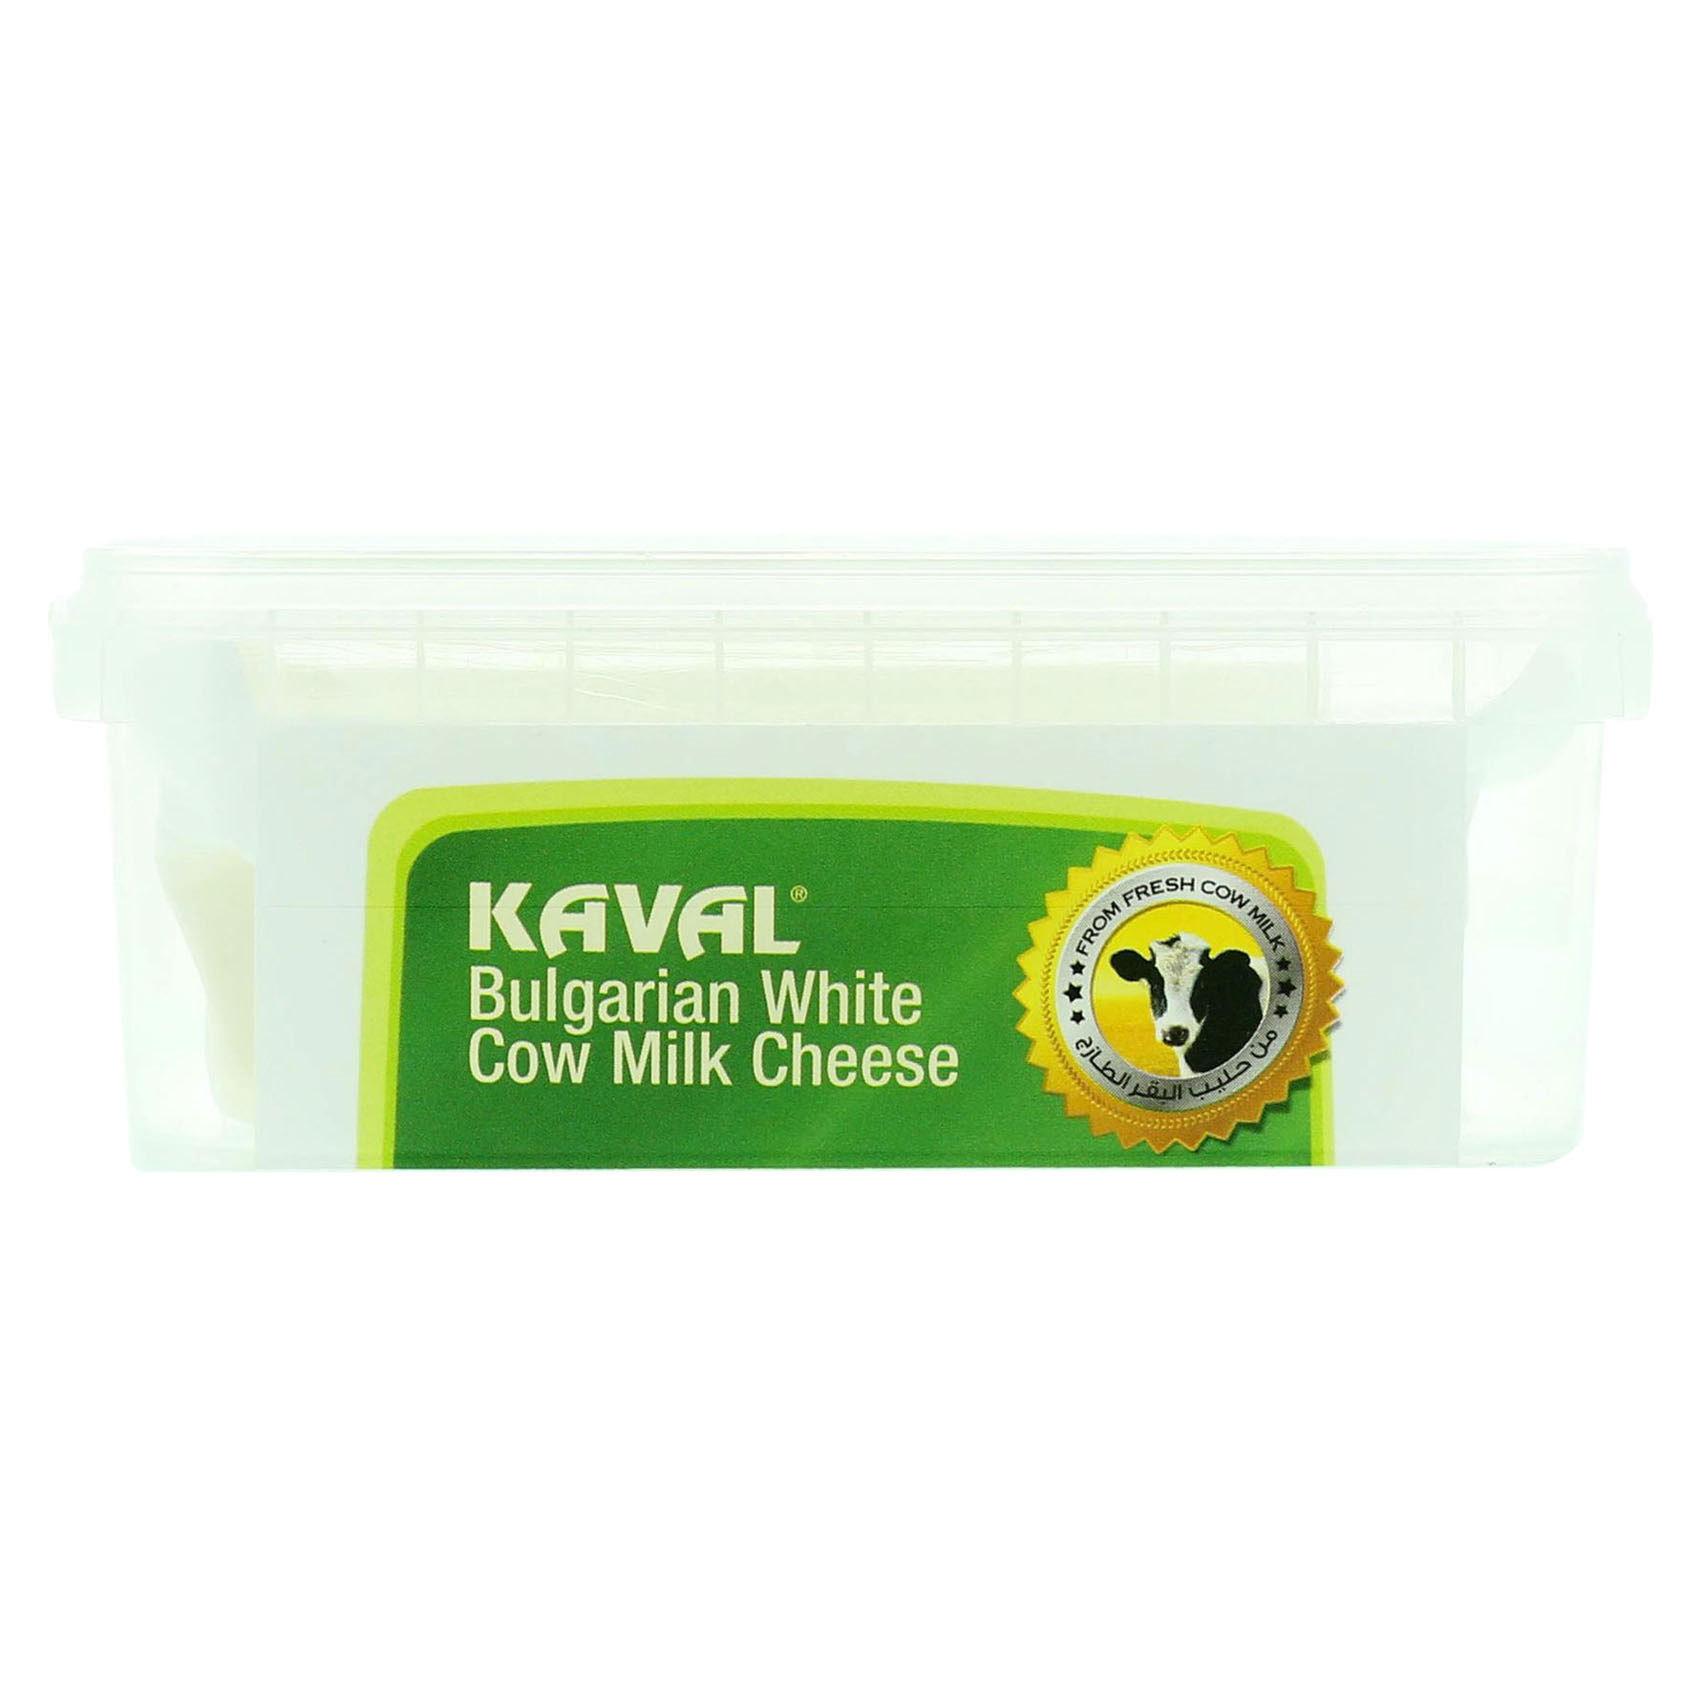 KAVAL BULGAR COW CHEESE 200GR